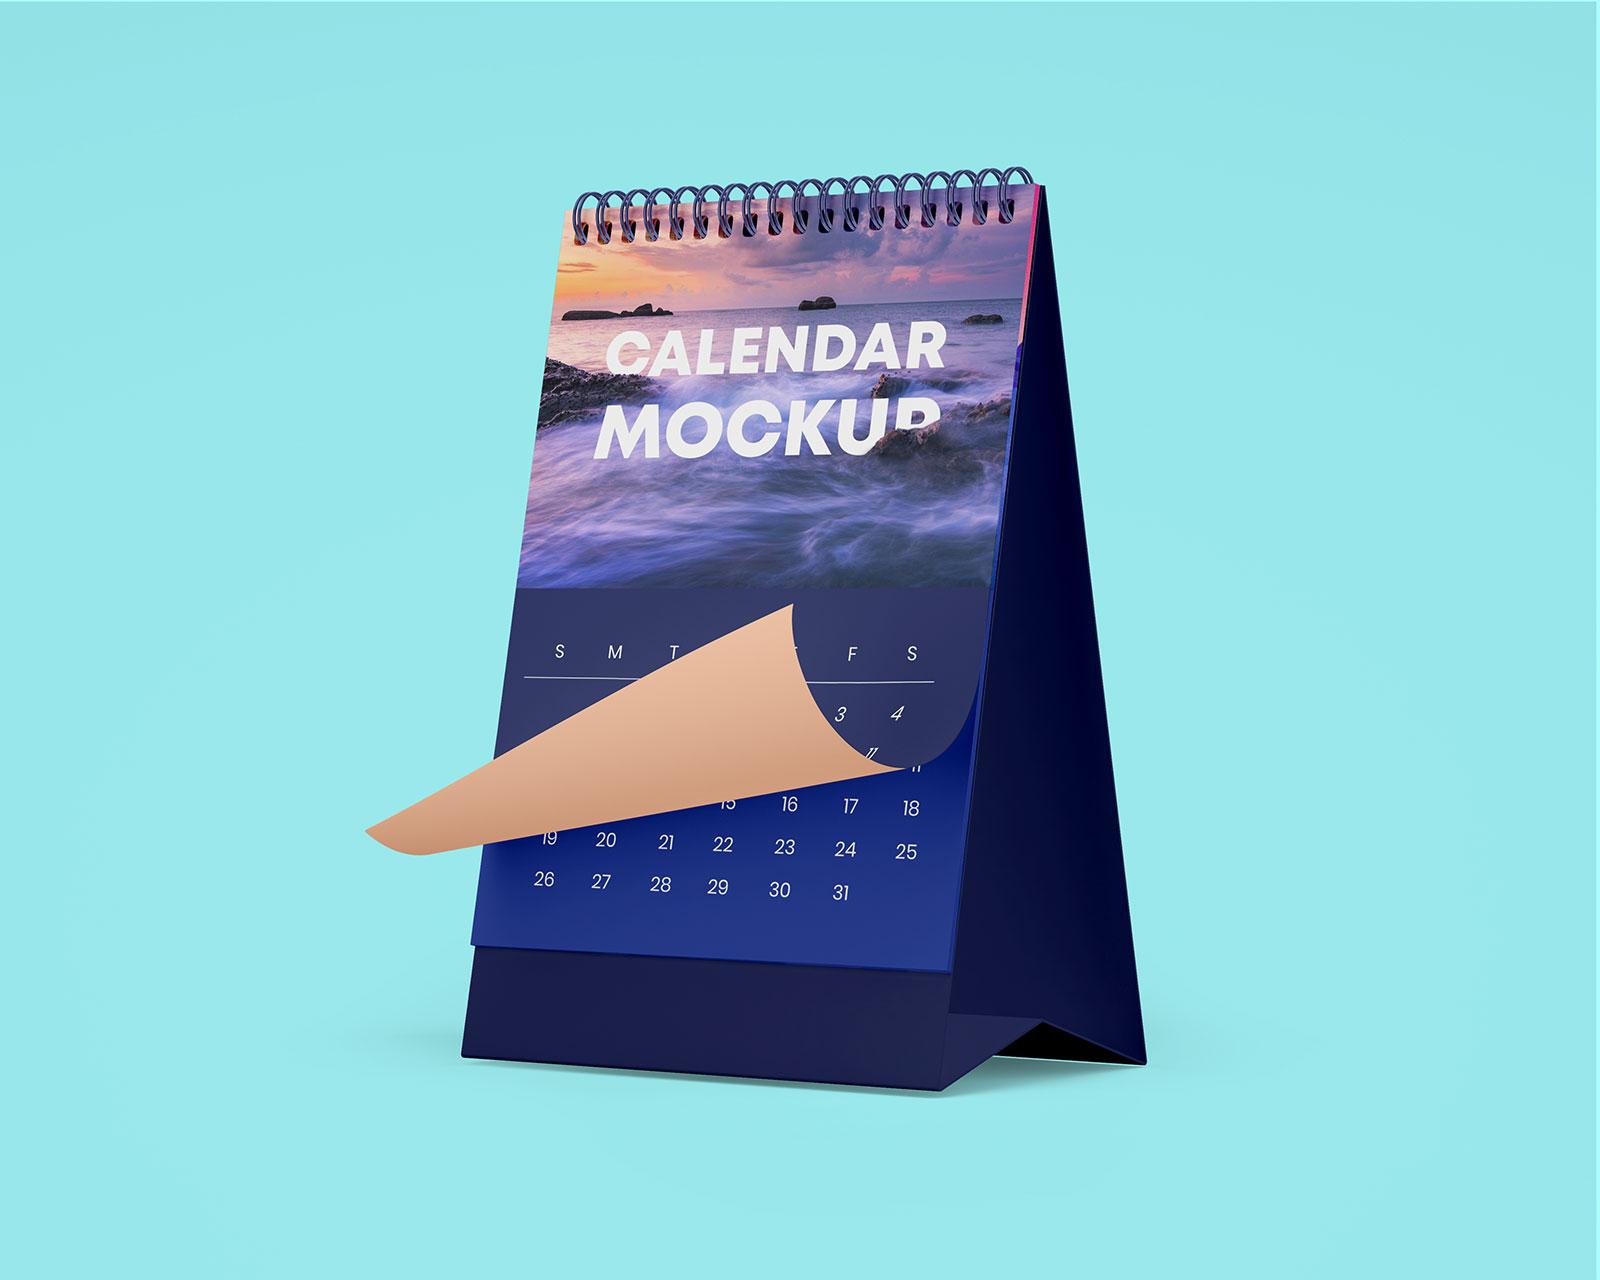 Free-Table-Office-Desk-Tent-Calendar-Mockup-PSD-Set